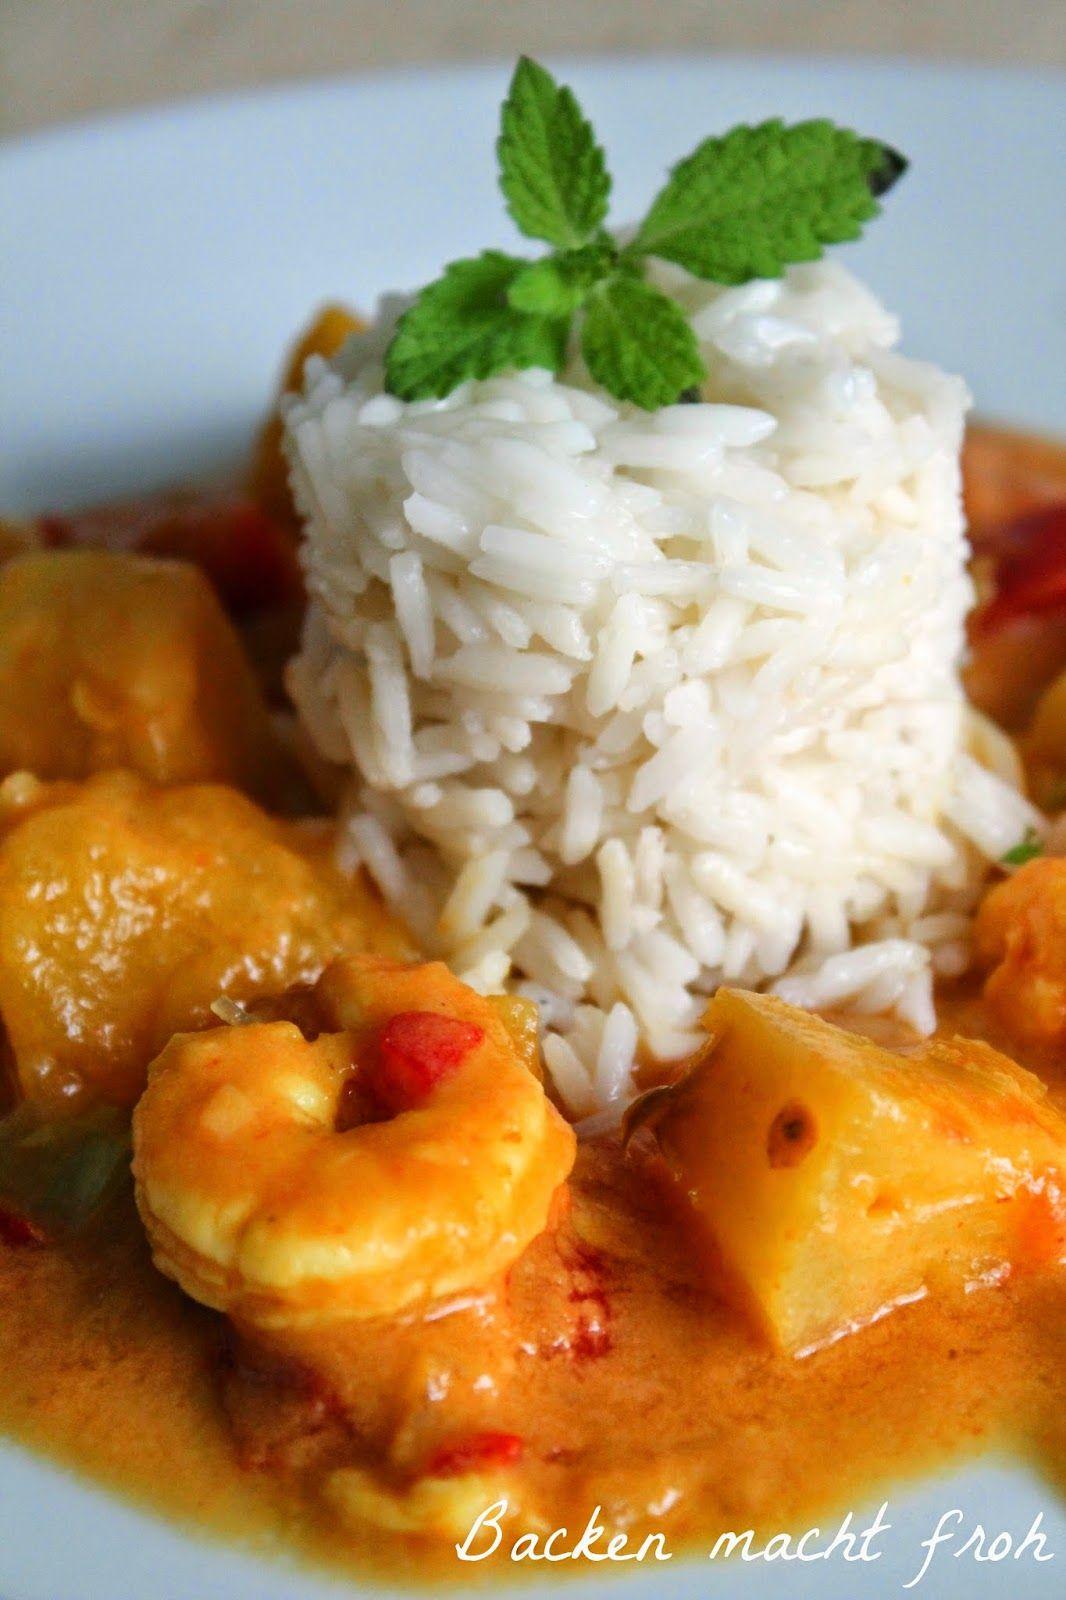 Backen macht froh-Kochen ebenso: yummilicious zur WM: Mangocurry brasil